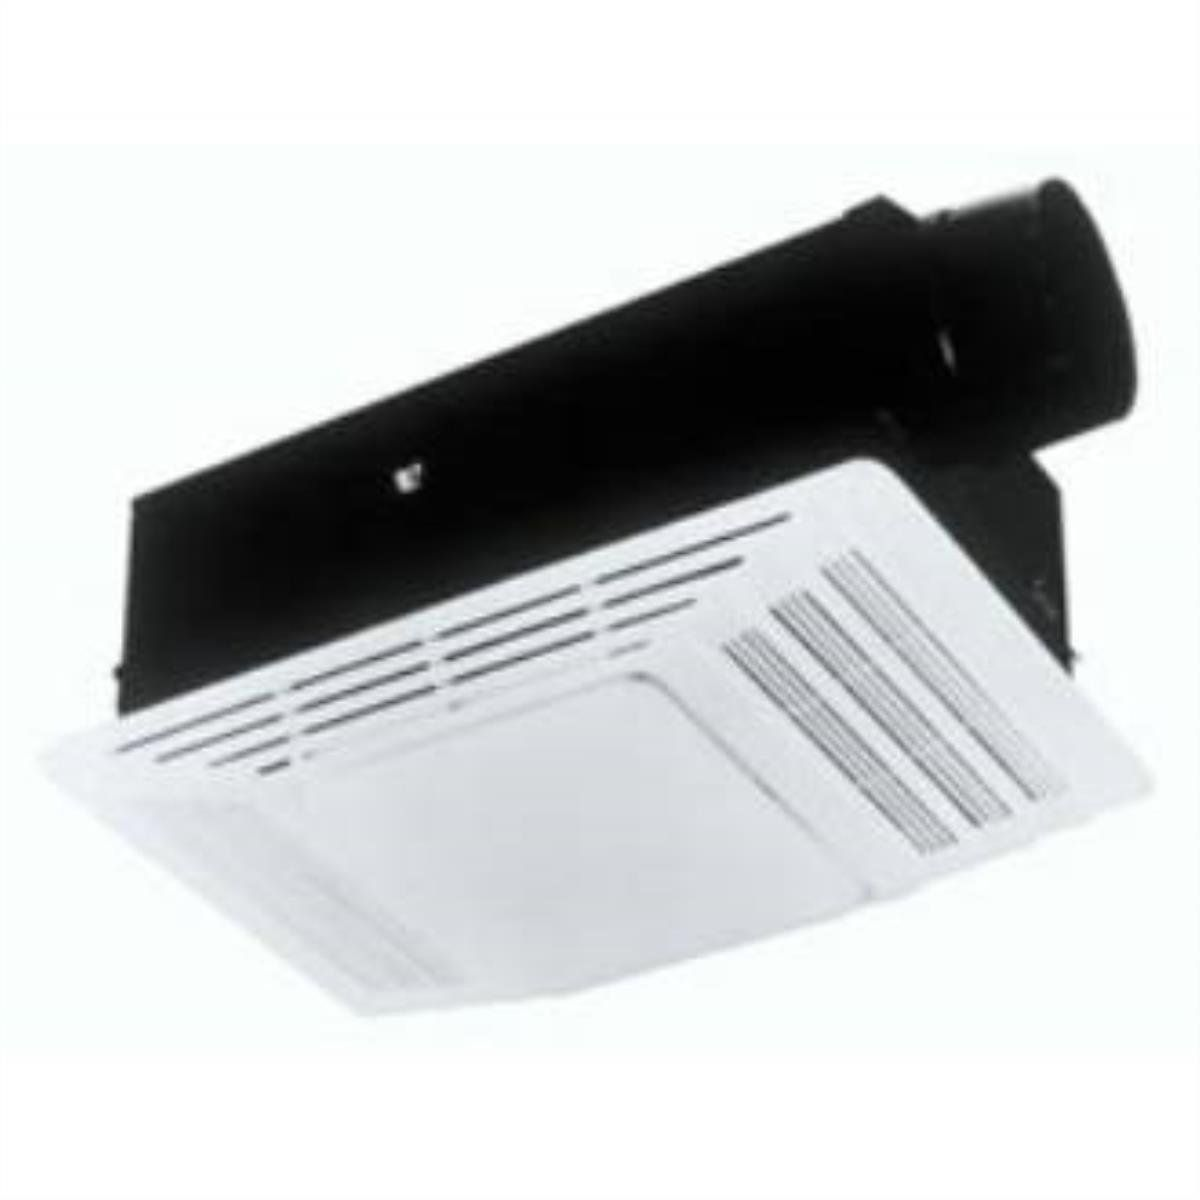 Black Friday 2014 Broan 655 Heater and Heater Bath Fan with Light Combination from Broan Cyber Monday  sc 1 st  Pinterest & 750w bathroom heater u0026 light unit   bathroom design 2017-2018 ...